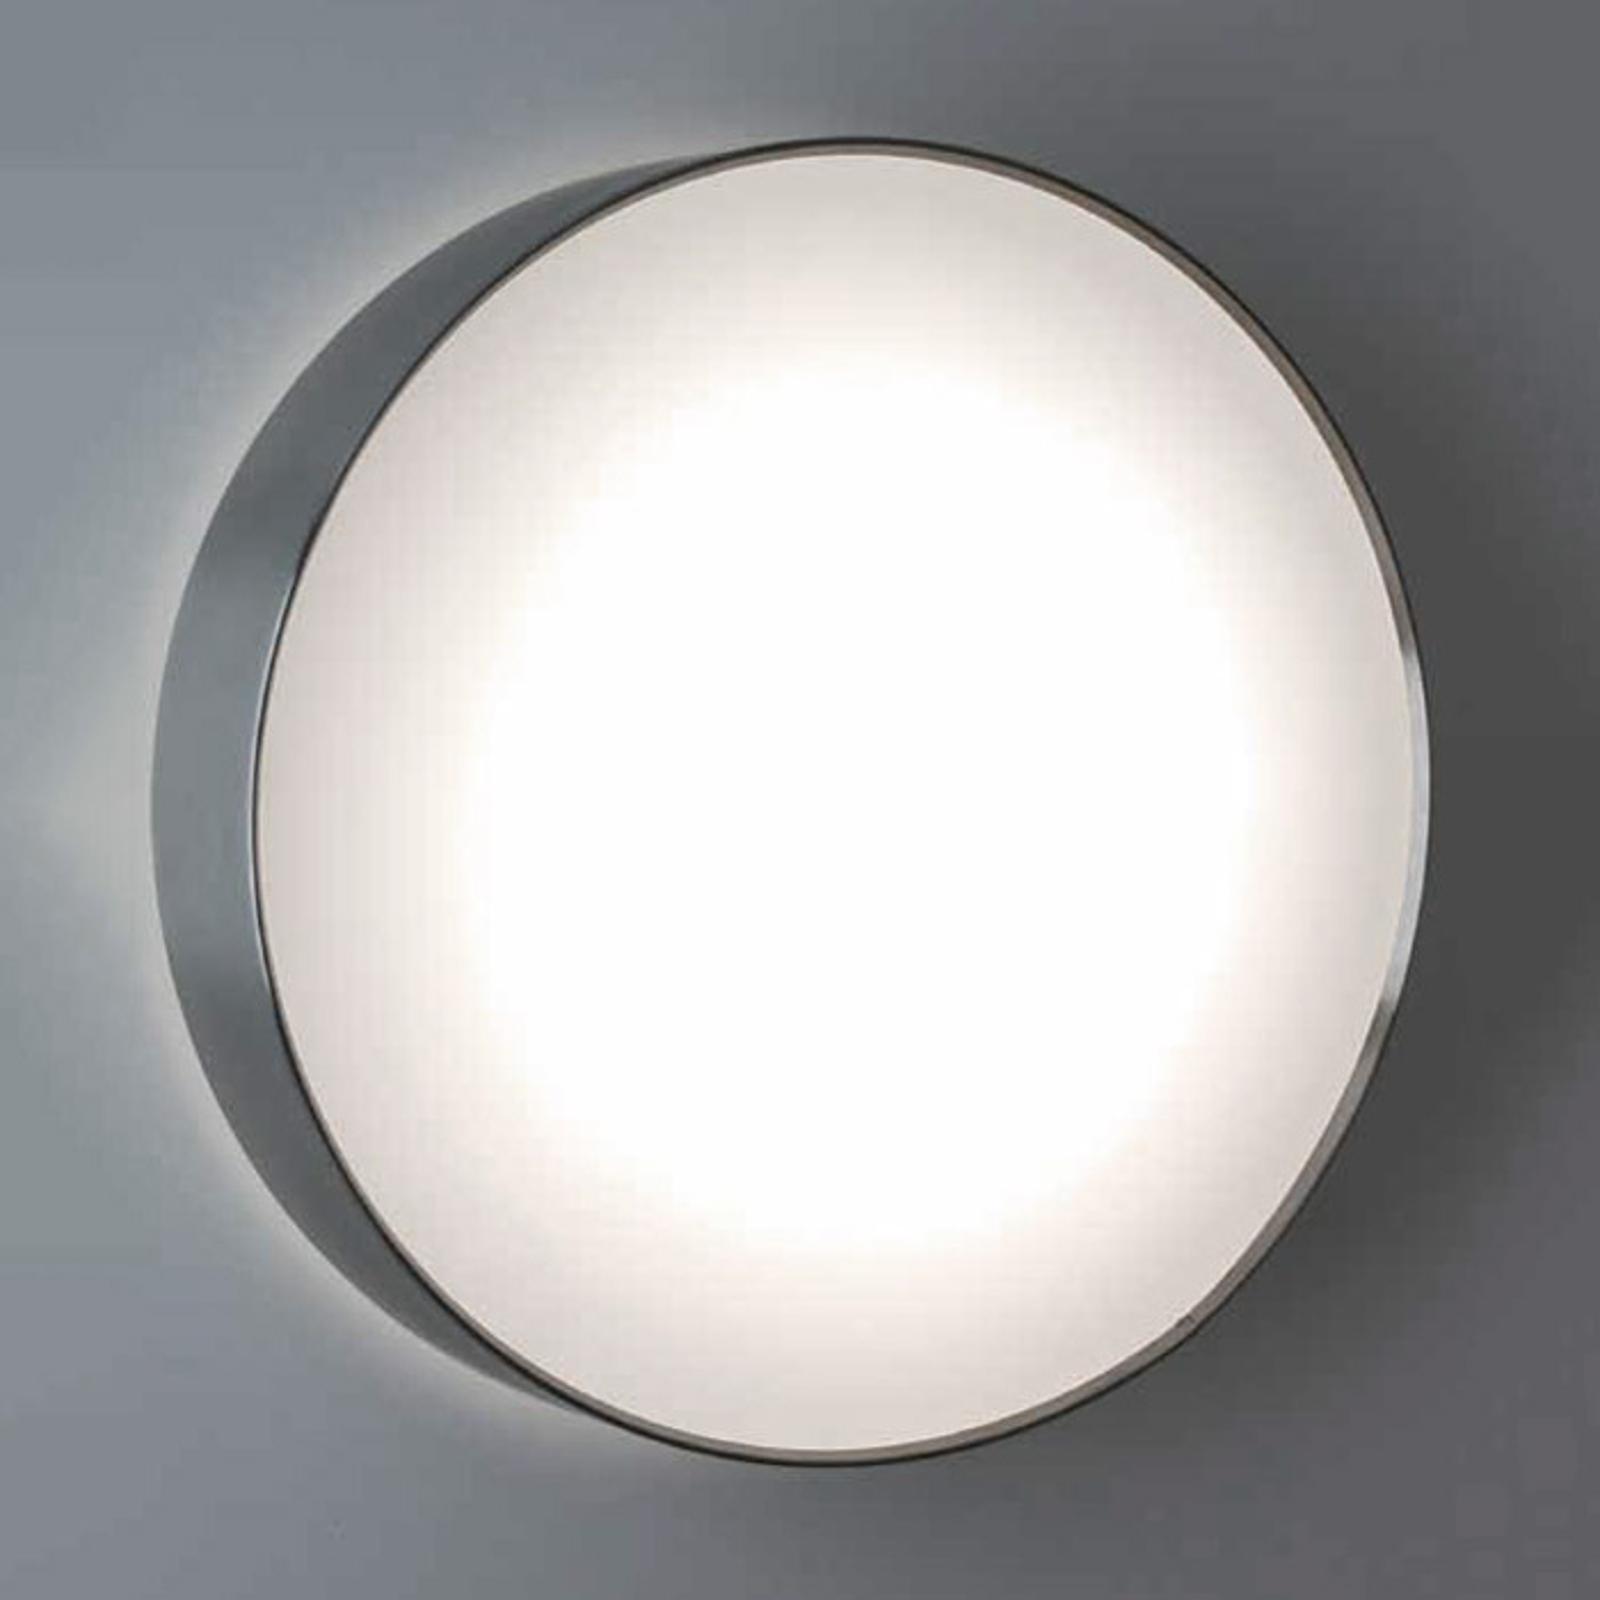 Edelstahl Wandleuchte SUN 4 LED, 8W 4K